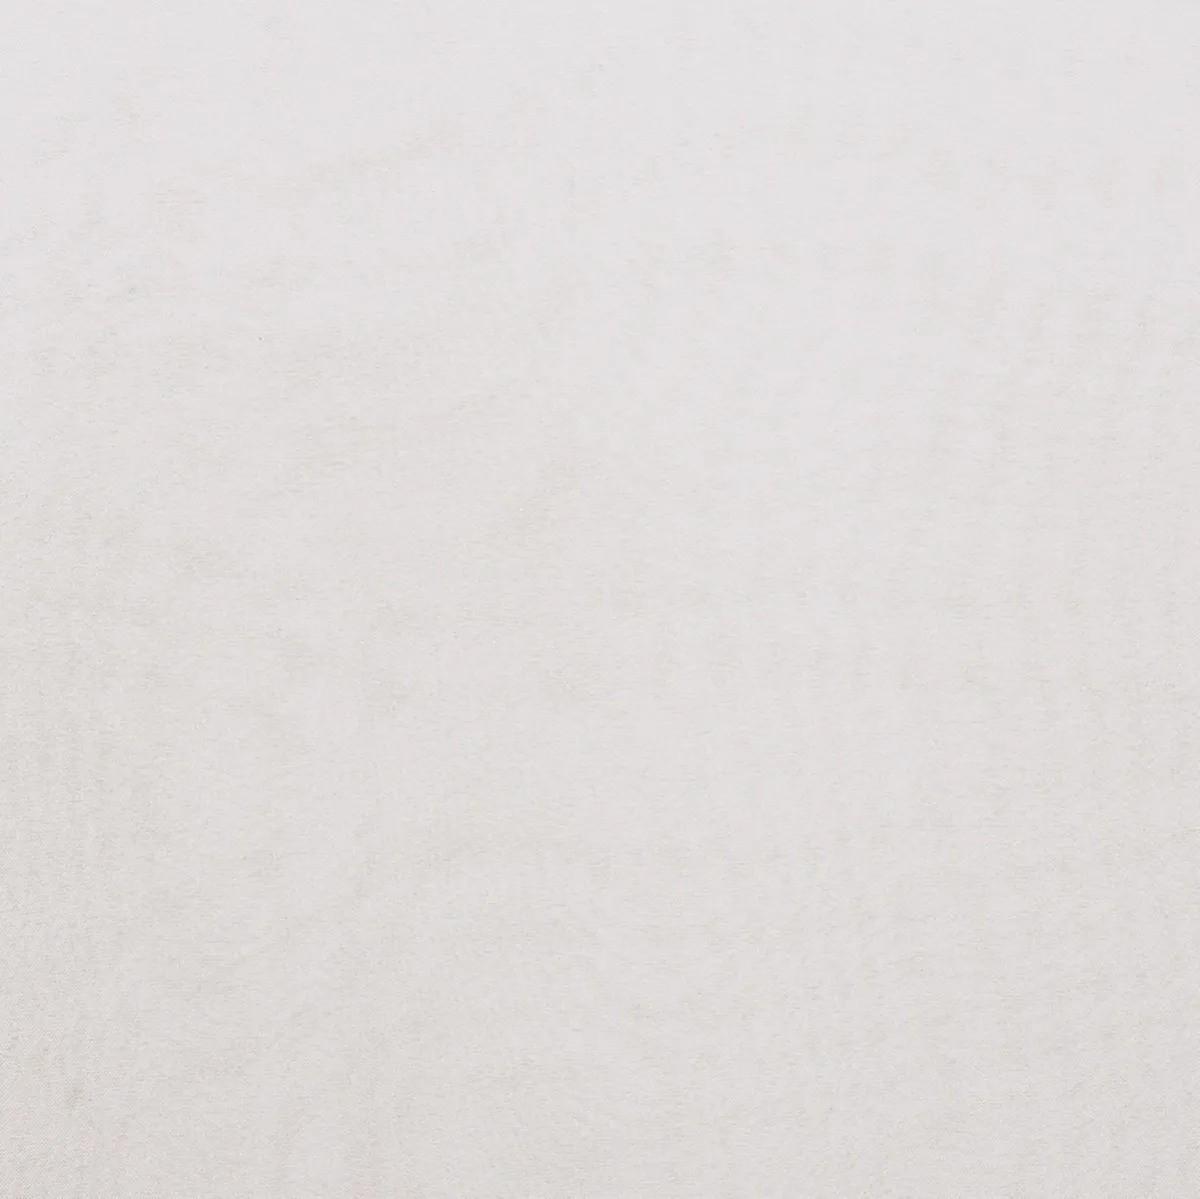 Cortina Blackout 100% Comfort Off White 2,60 x 1,70 Bella Janela